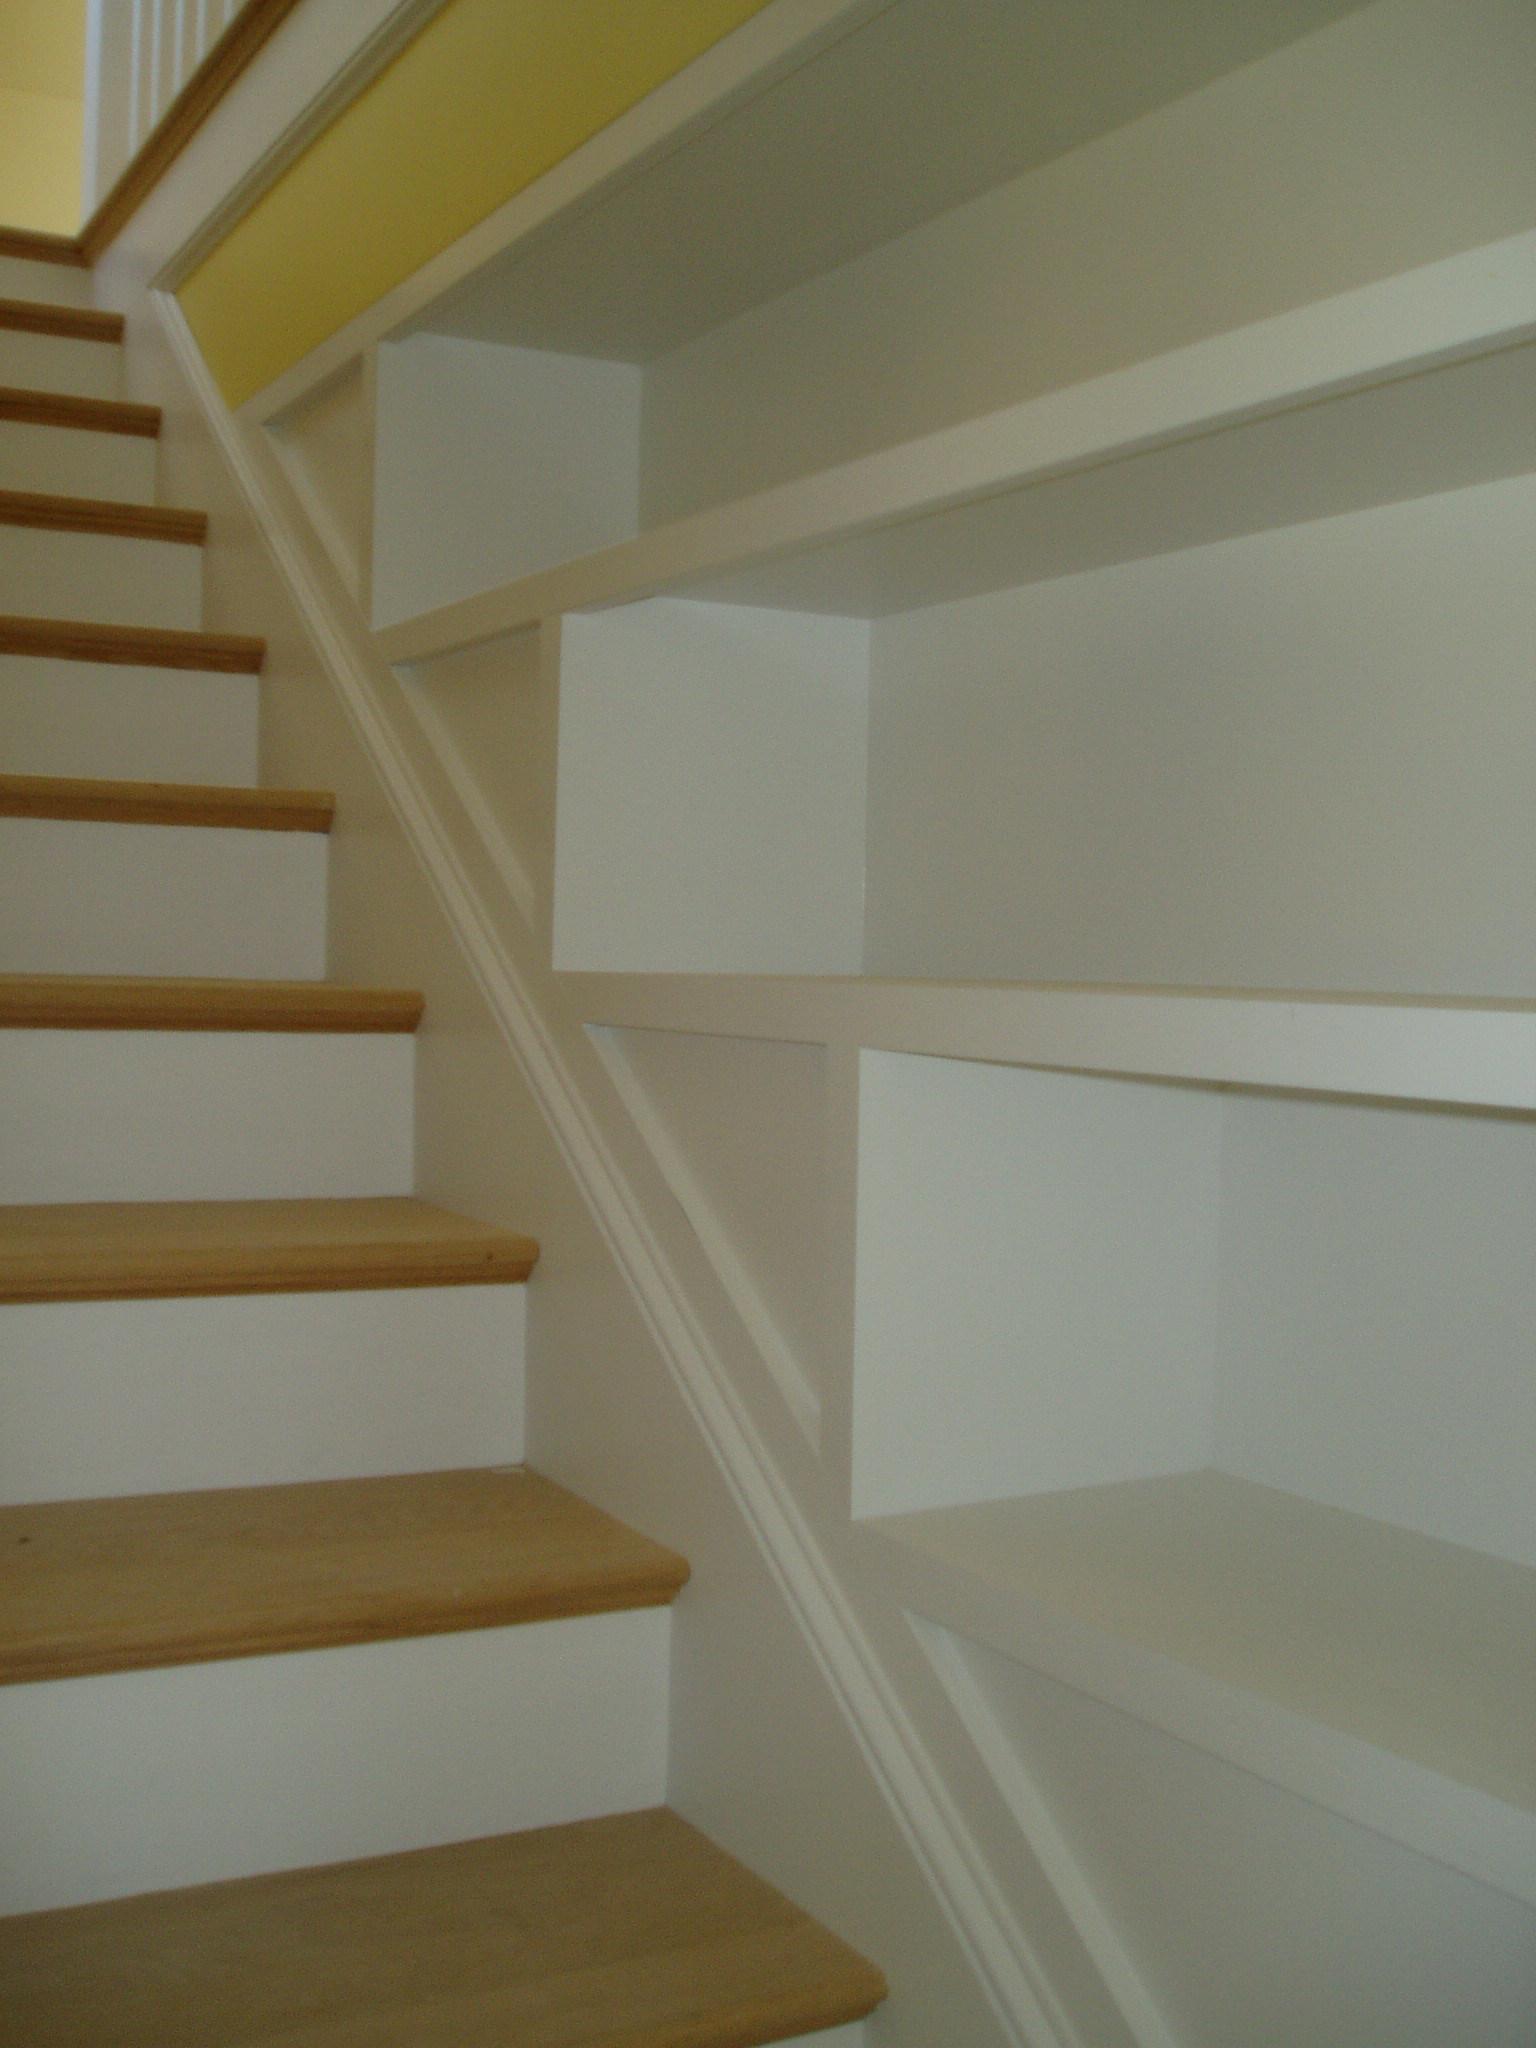 mcnally shelf2.JPG